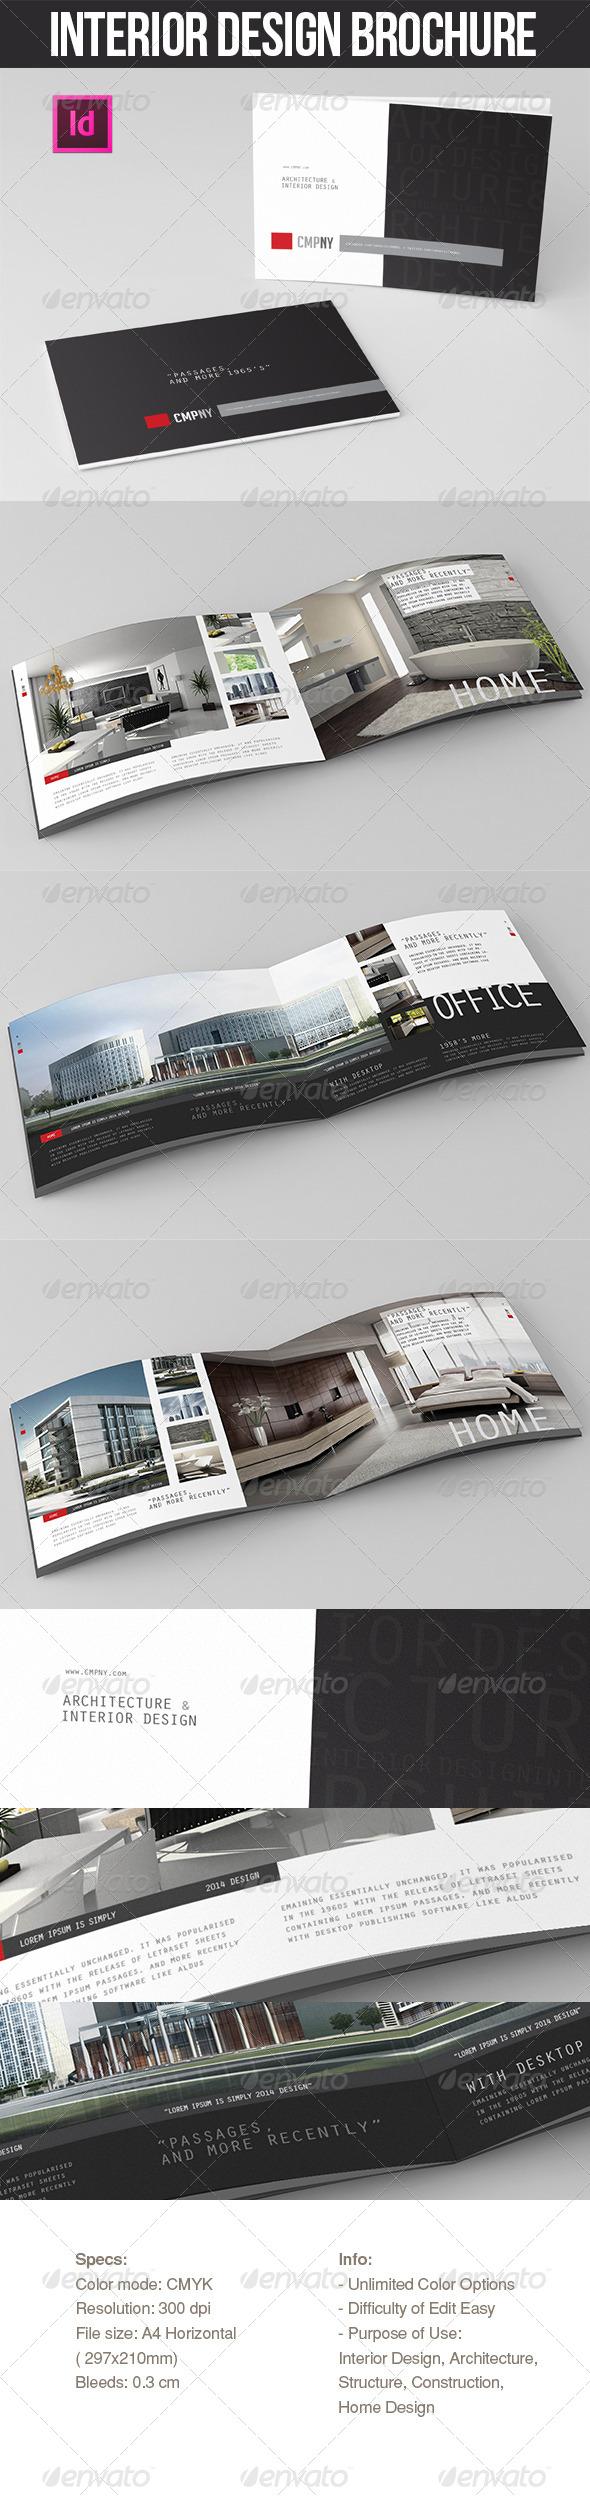 GraphicRiver INTERIOR DESIGN BROCHURE YMC DESIGN 7174312